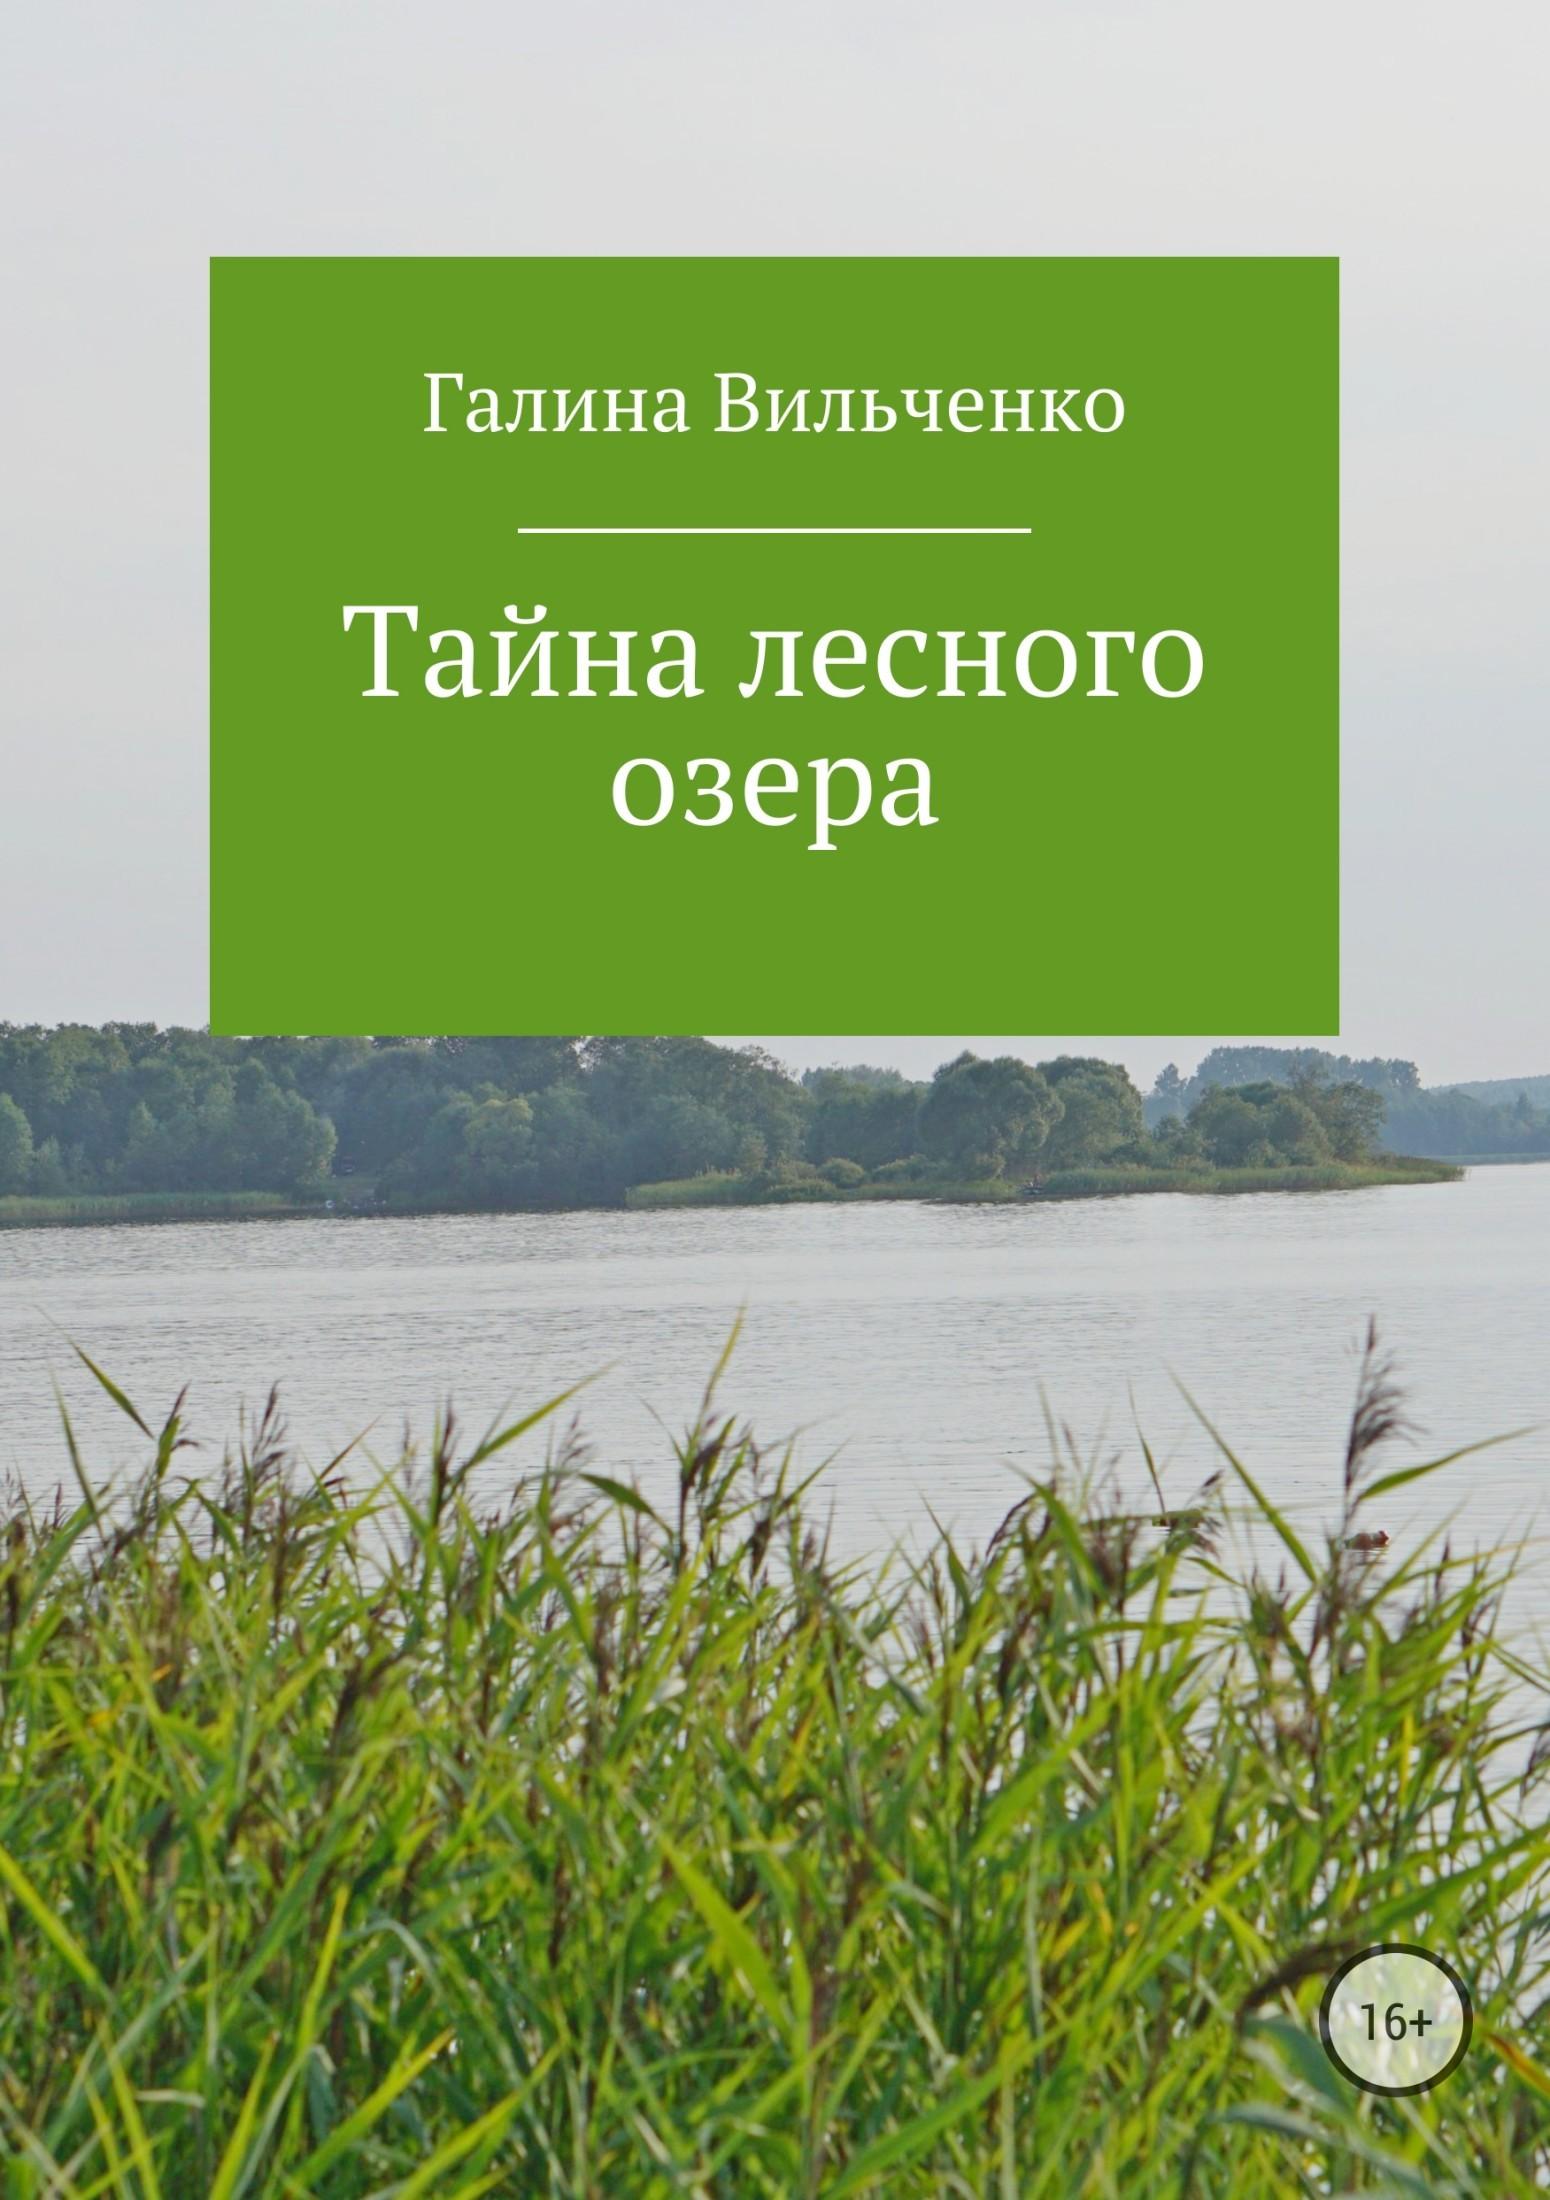 Тайна лесного озера